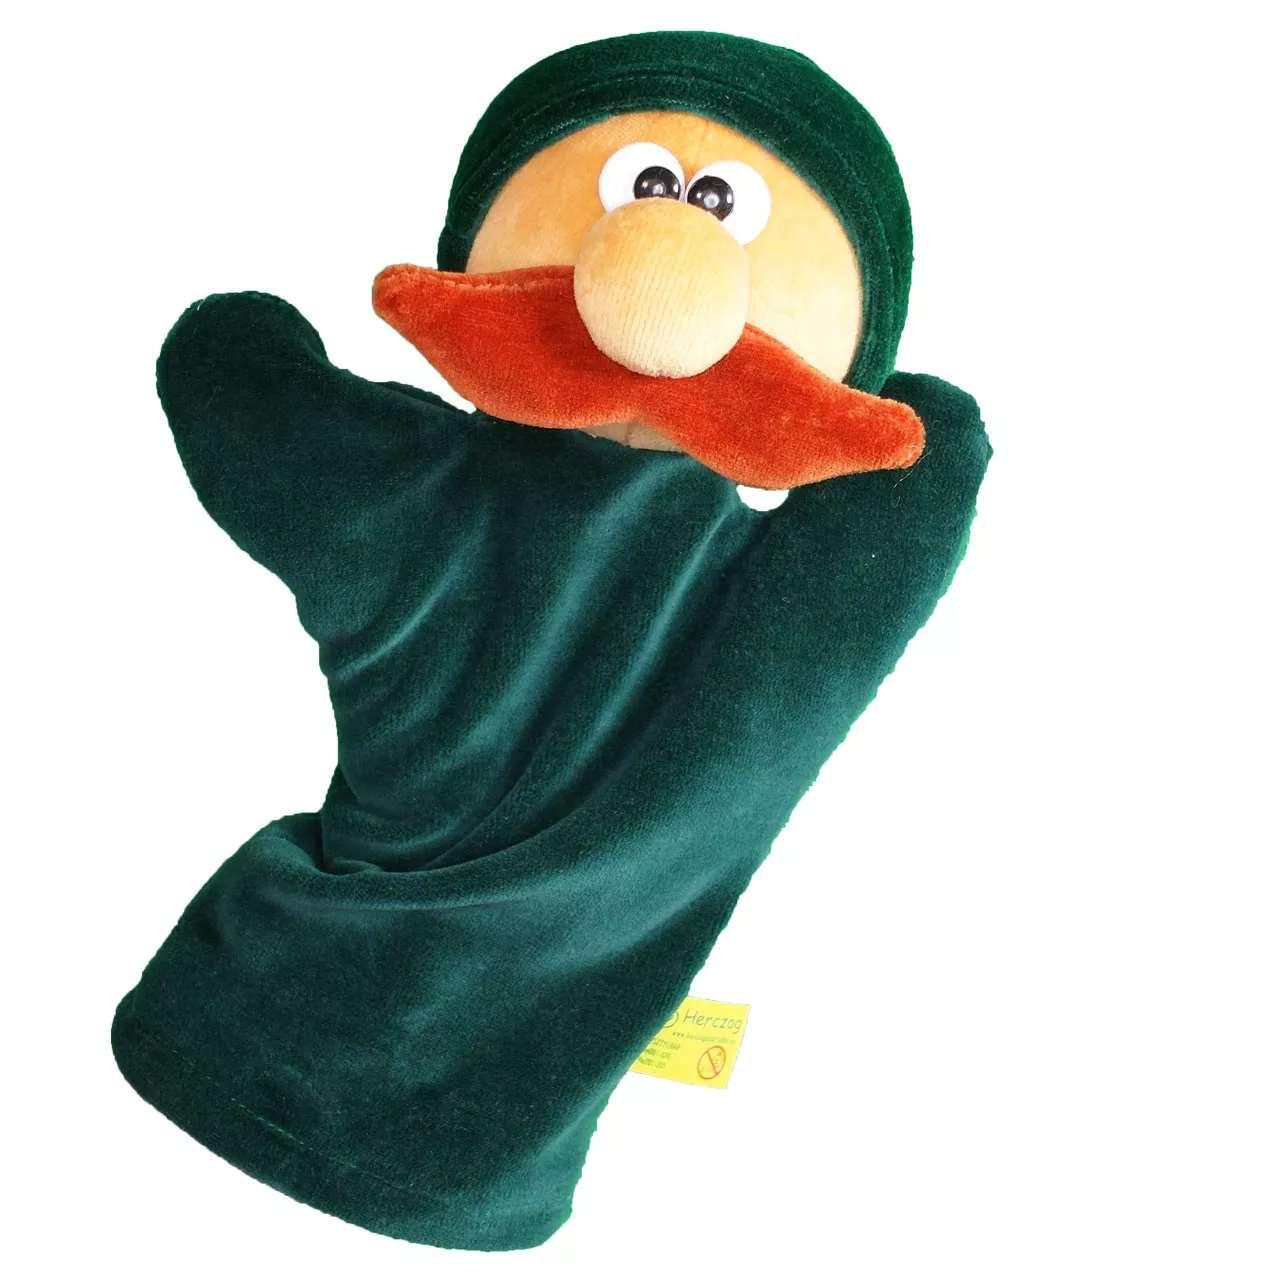 Handpuppe Jäger dunkelgrün ohne Gürtel